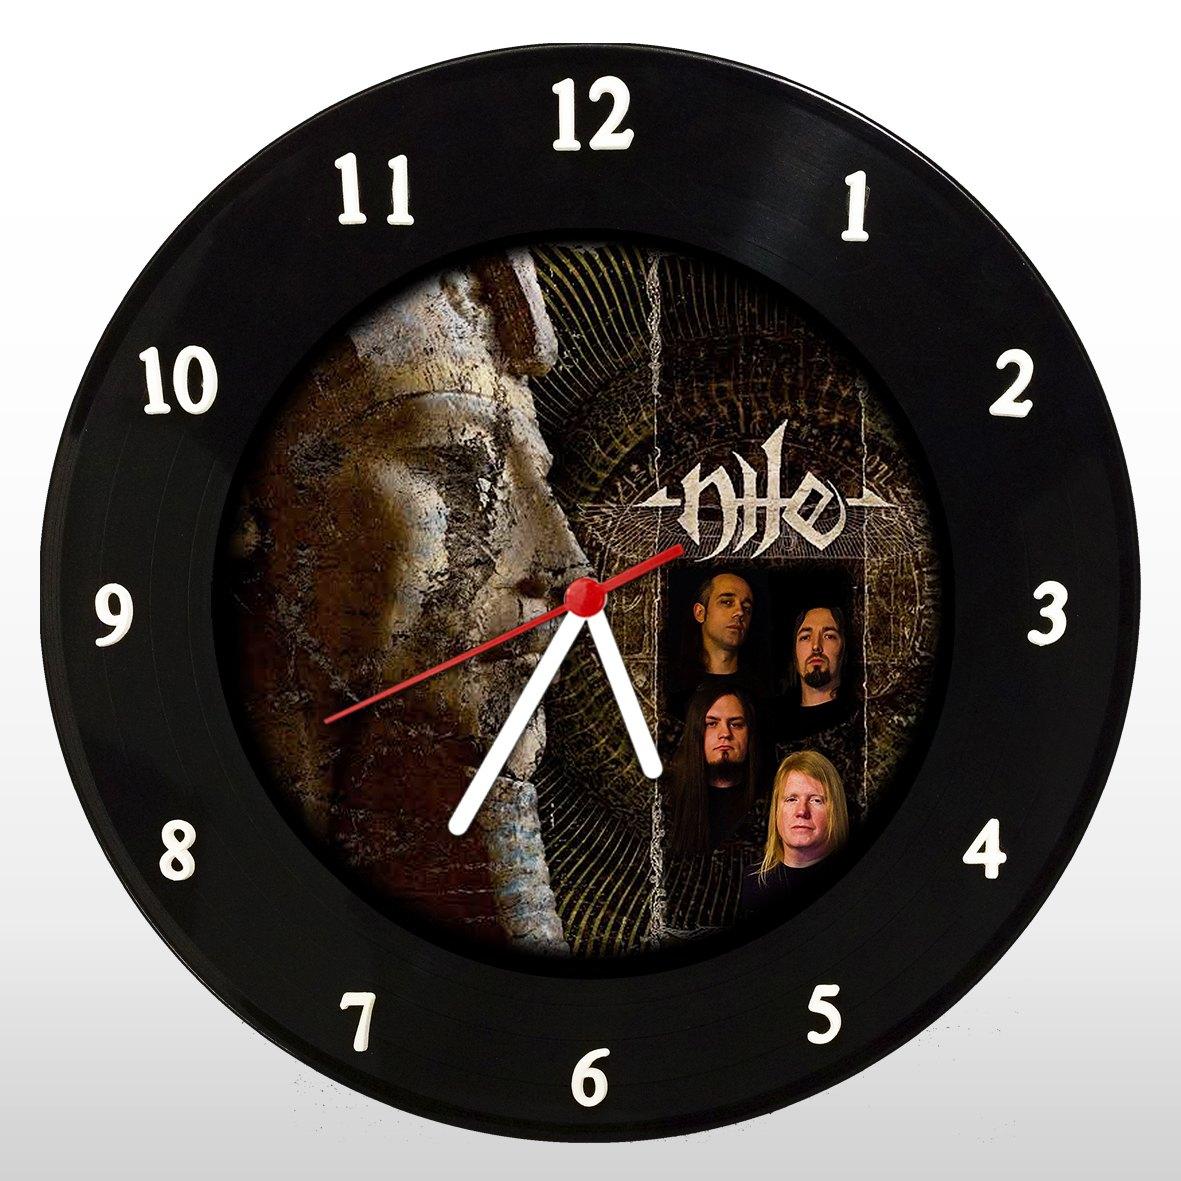 Nile - Relógio de Parede em Disco de Vinil - Mr. Rock